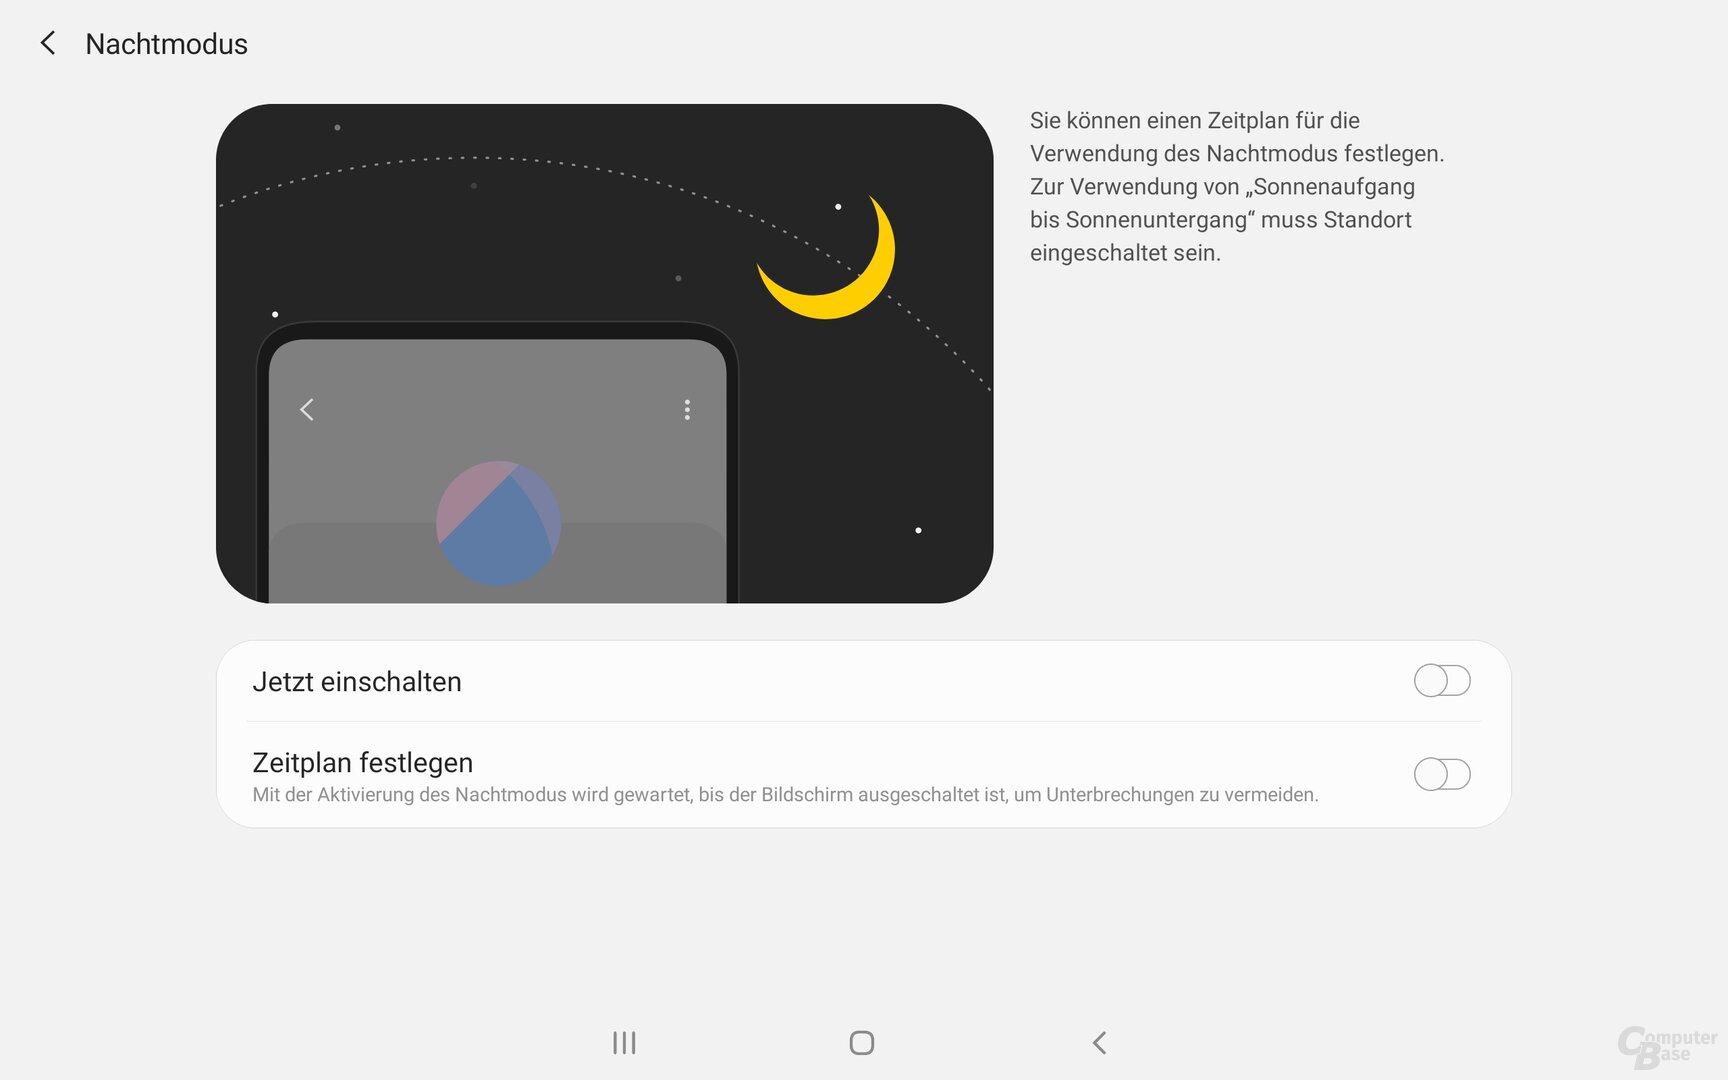 Der Nachtmodus des Galaxy Tab S5e